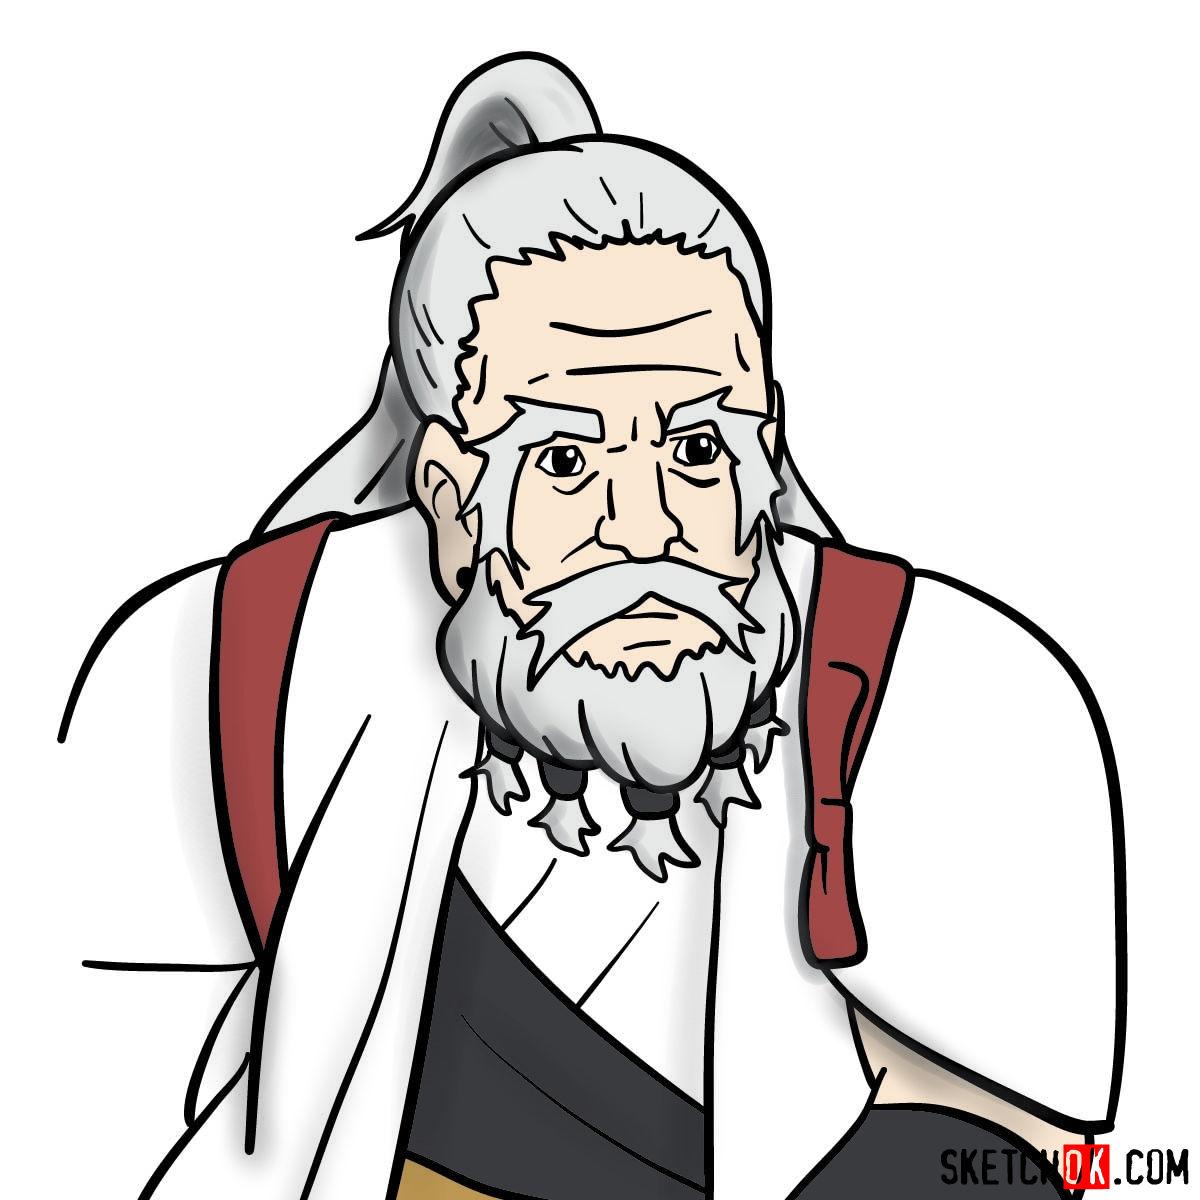 How to draw the long bearded dwarf (Dwarf Shaman) from Goblin Slayer anime